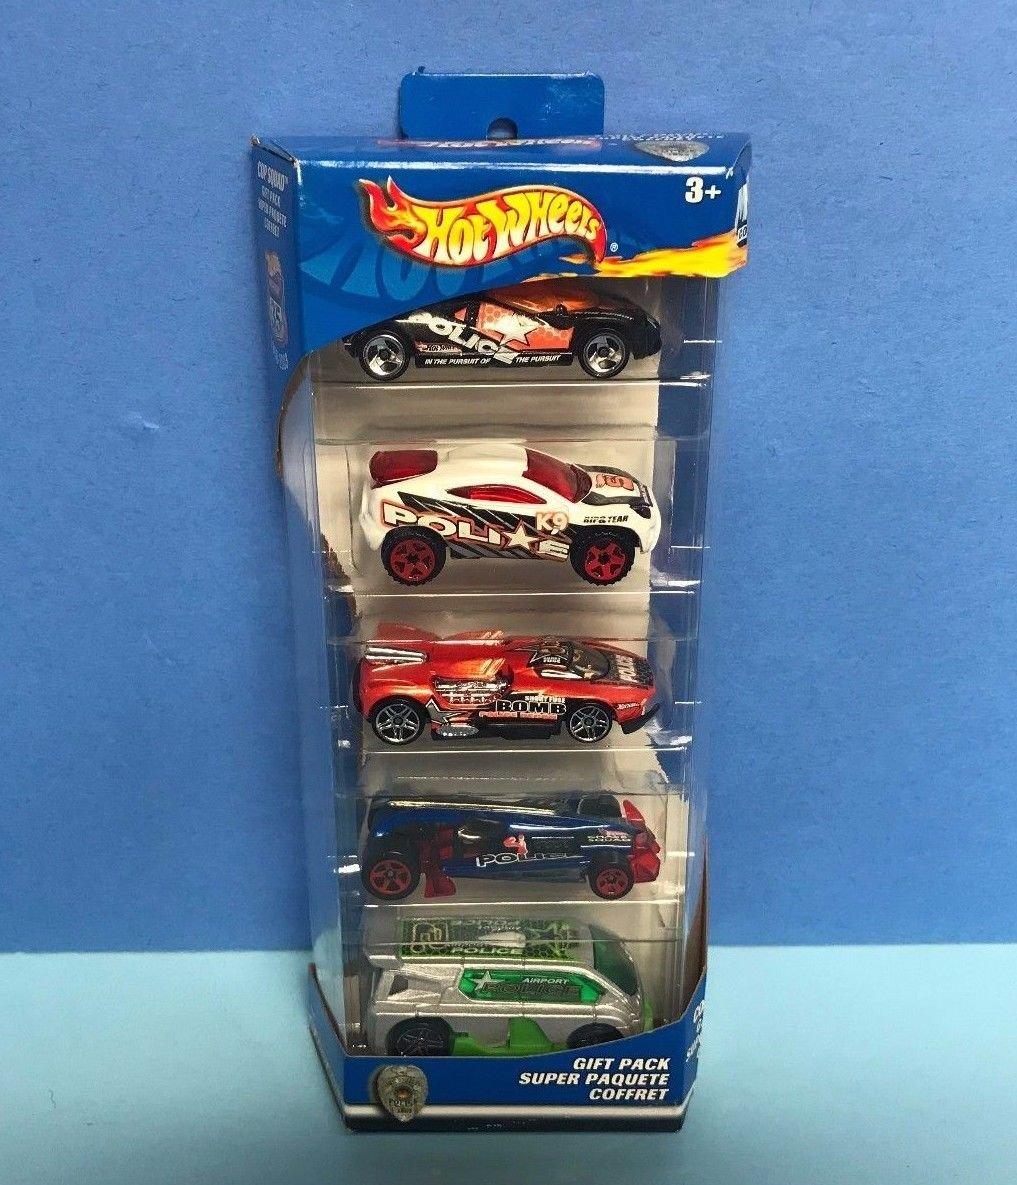 COP SQUAD Gift Pack 2002 Mattel HOT WHEELS diecast 5 car set